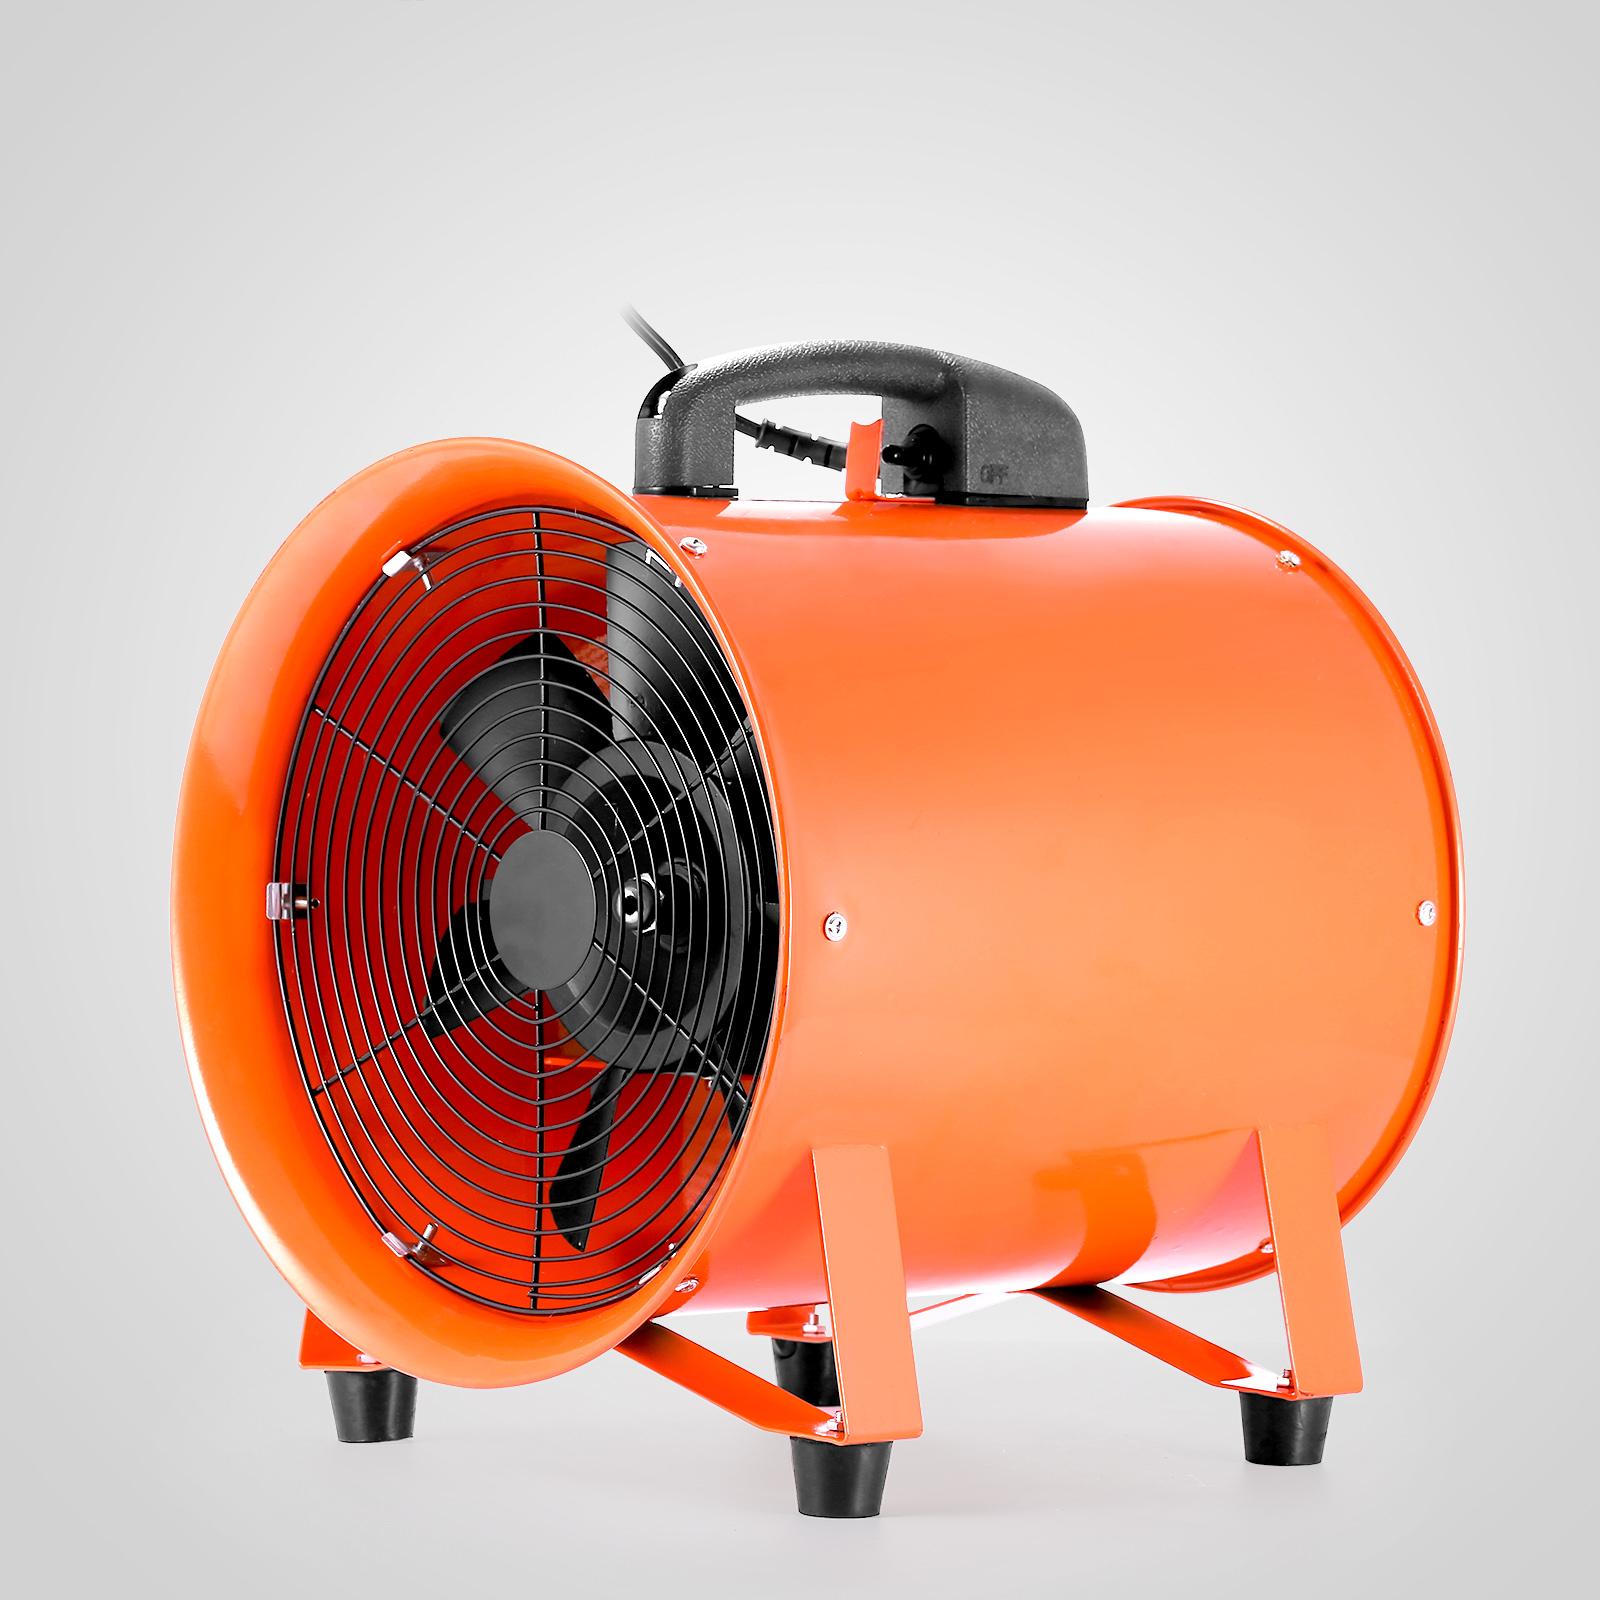 Industrial Blower Motor : Quot industrial fan ventilator fume extractor blower high